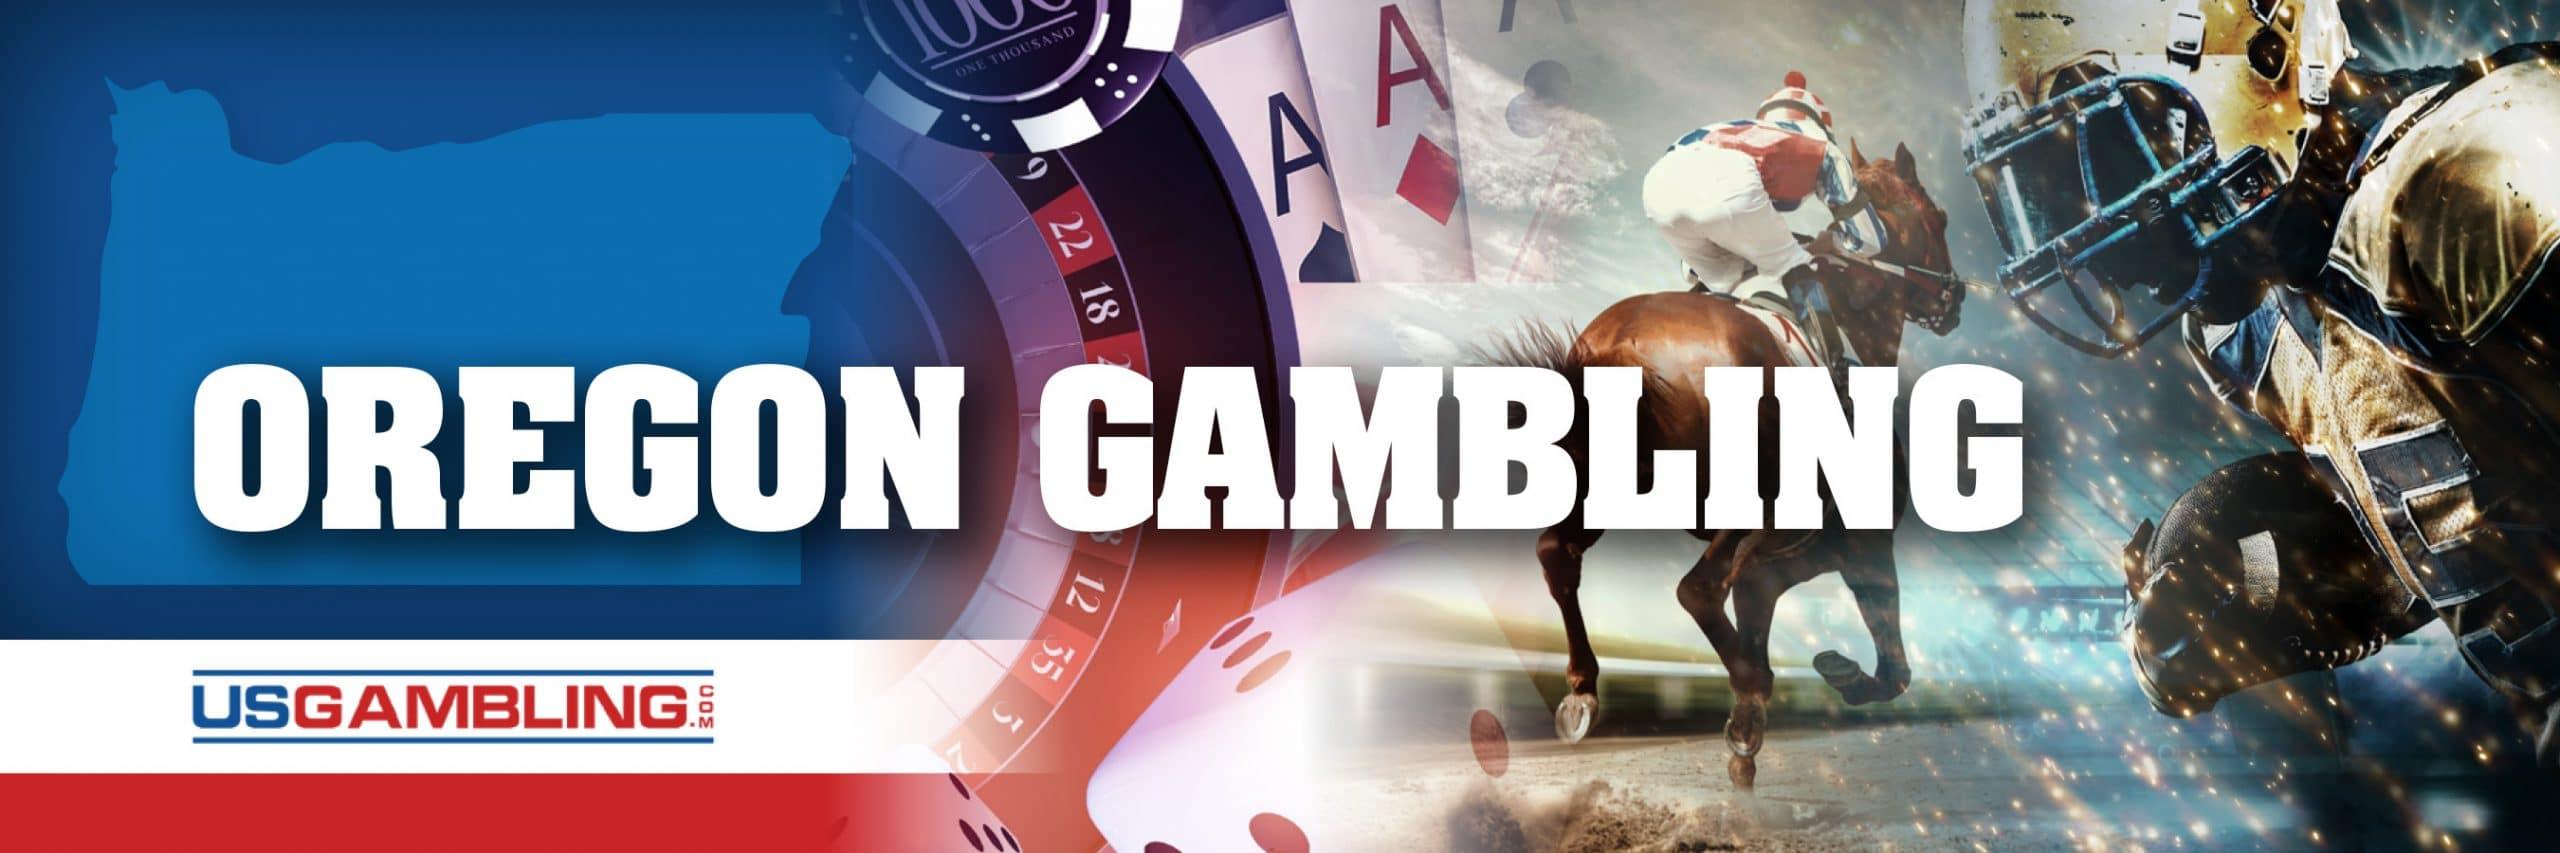 Legal Oregon Gambling